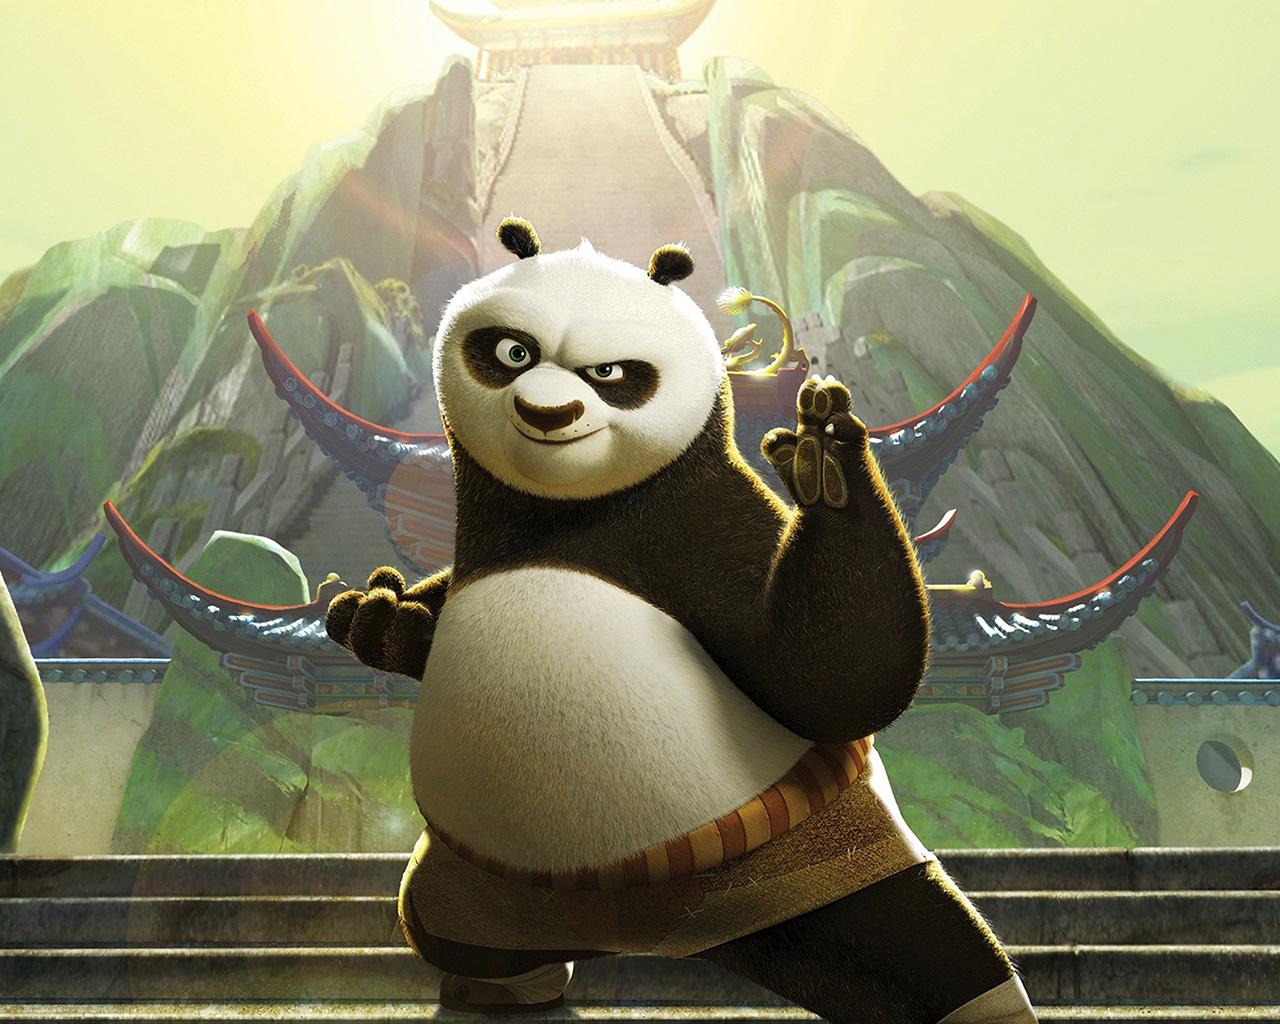 Hd Cute Panda Wallpaper An47 Kungfu Panda Dreamworks Animation Art Cute Papers Co